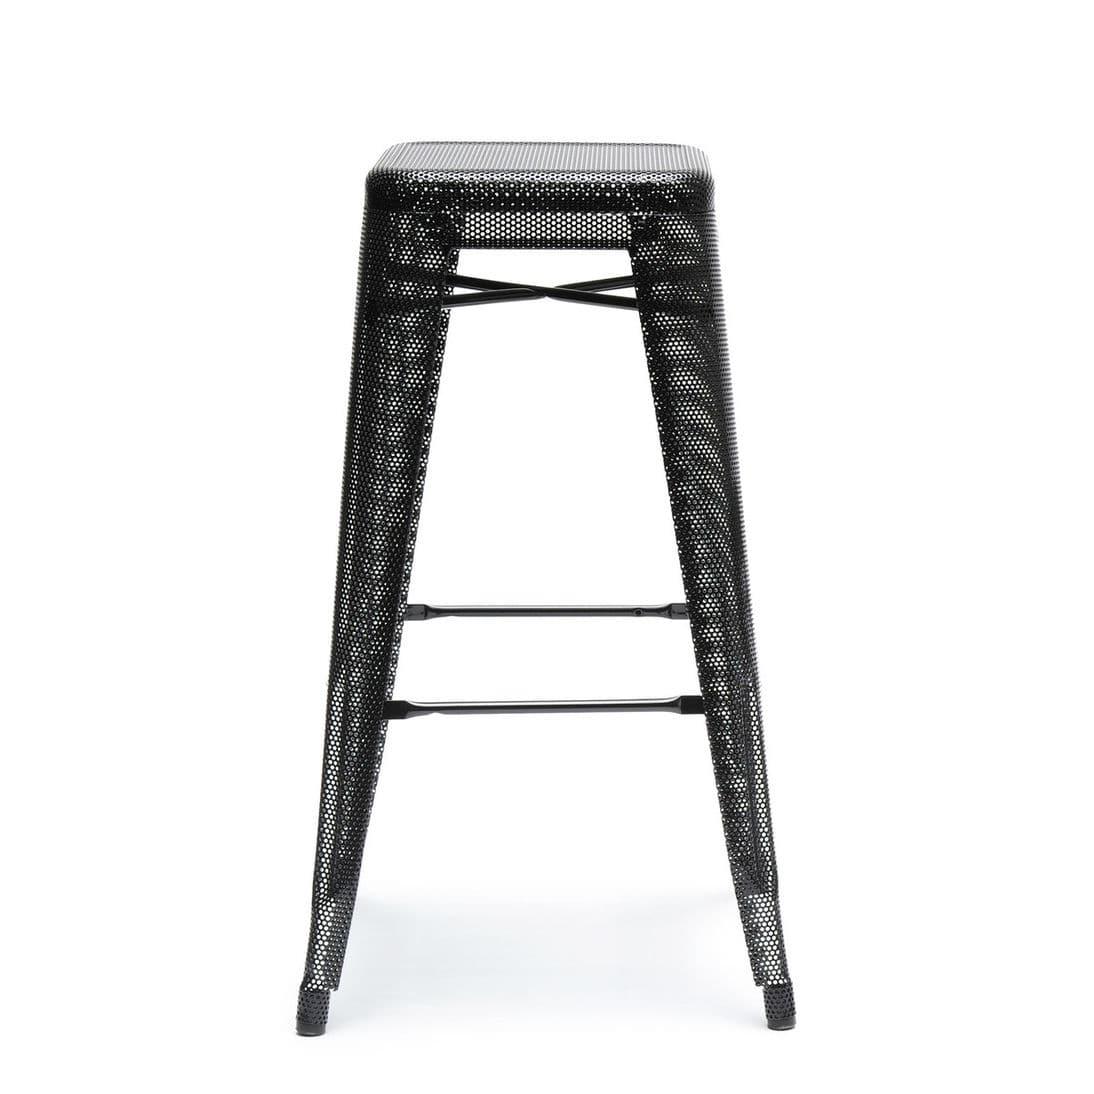 tabouret de bar contemporain   en acier   en acier laqué   empilable - H75  PERFORÉ by Chantal Andriot b791a4a3158c